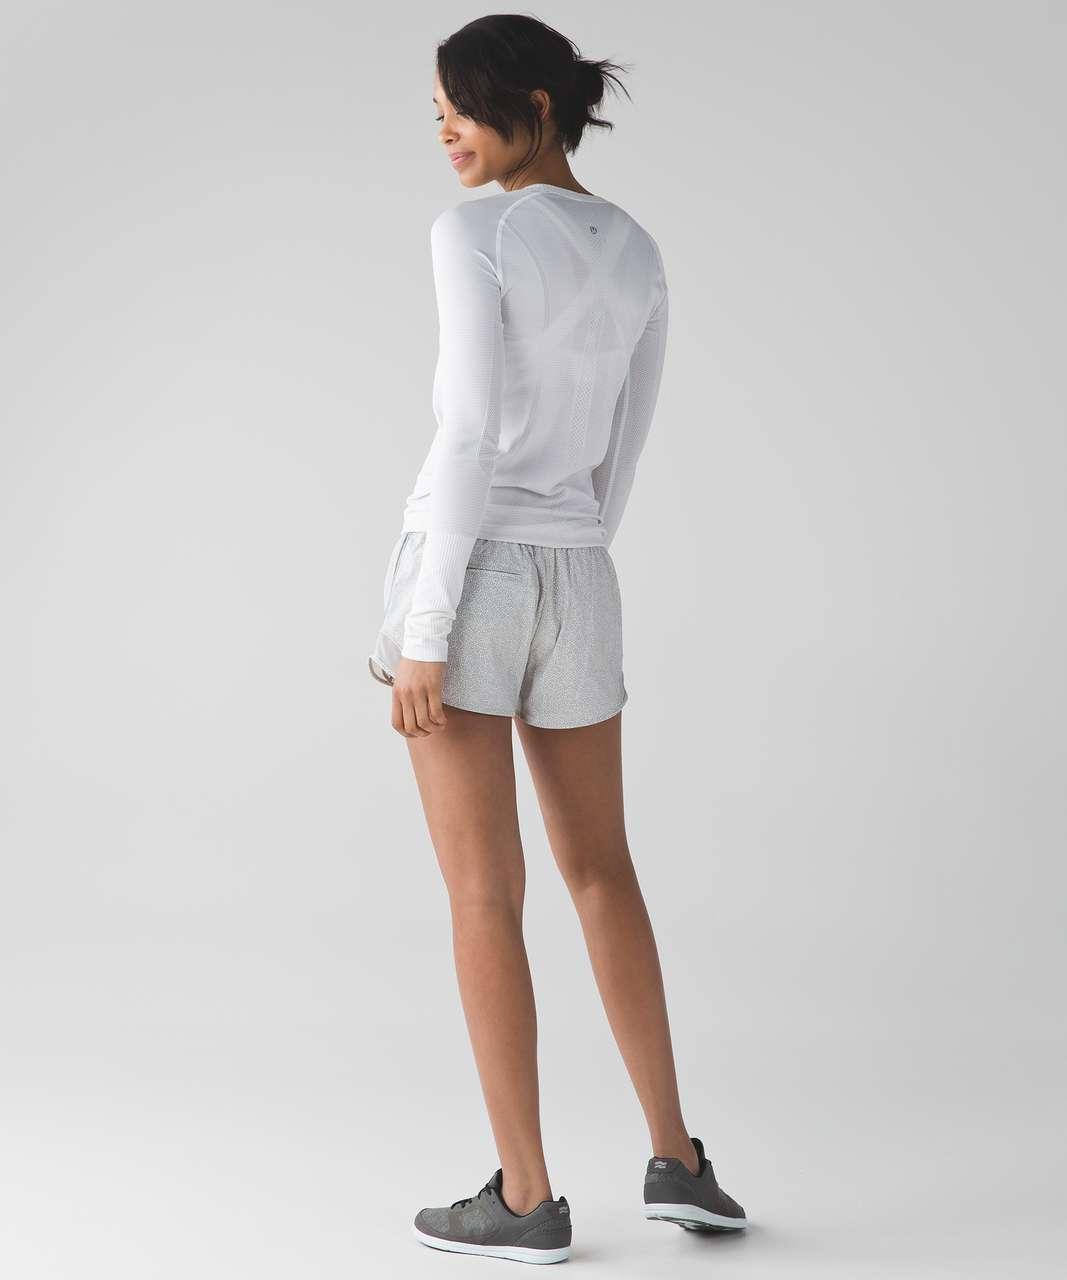 "Lululemon Hotty Hot Short (Long 4"") - Freckle Flower White Seal Grey / Seal Grey"